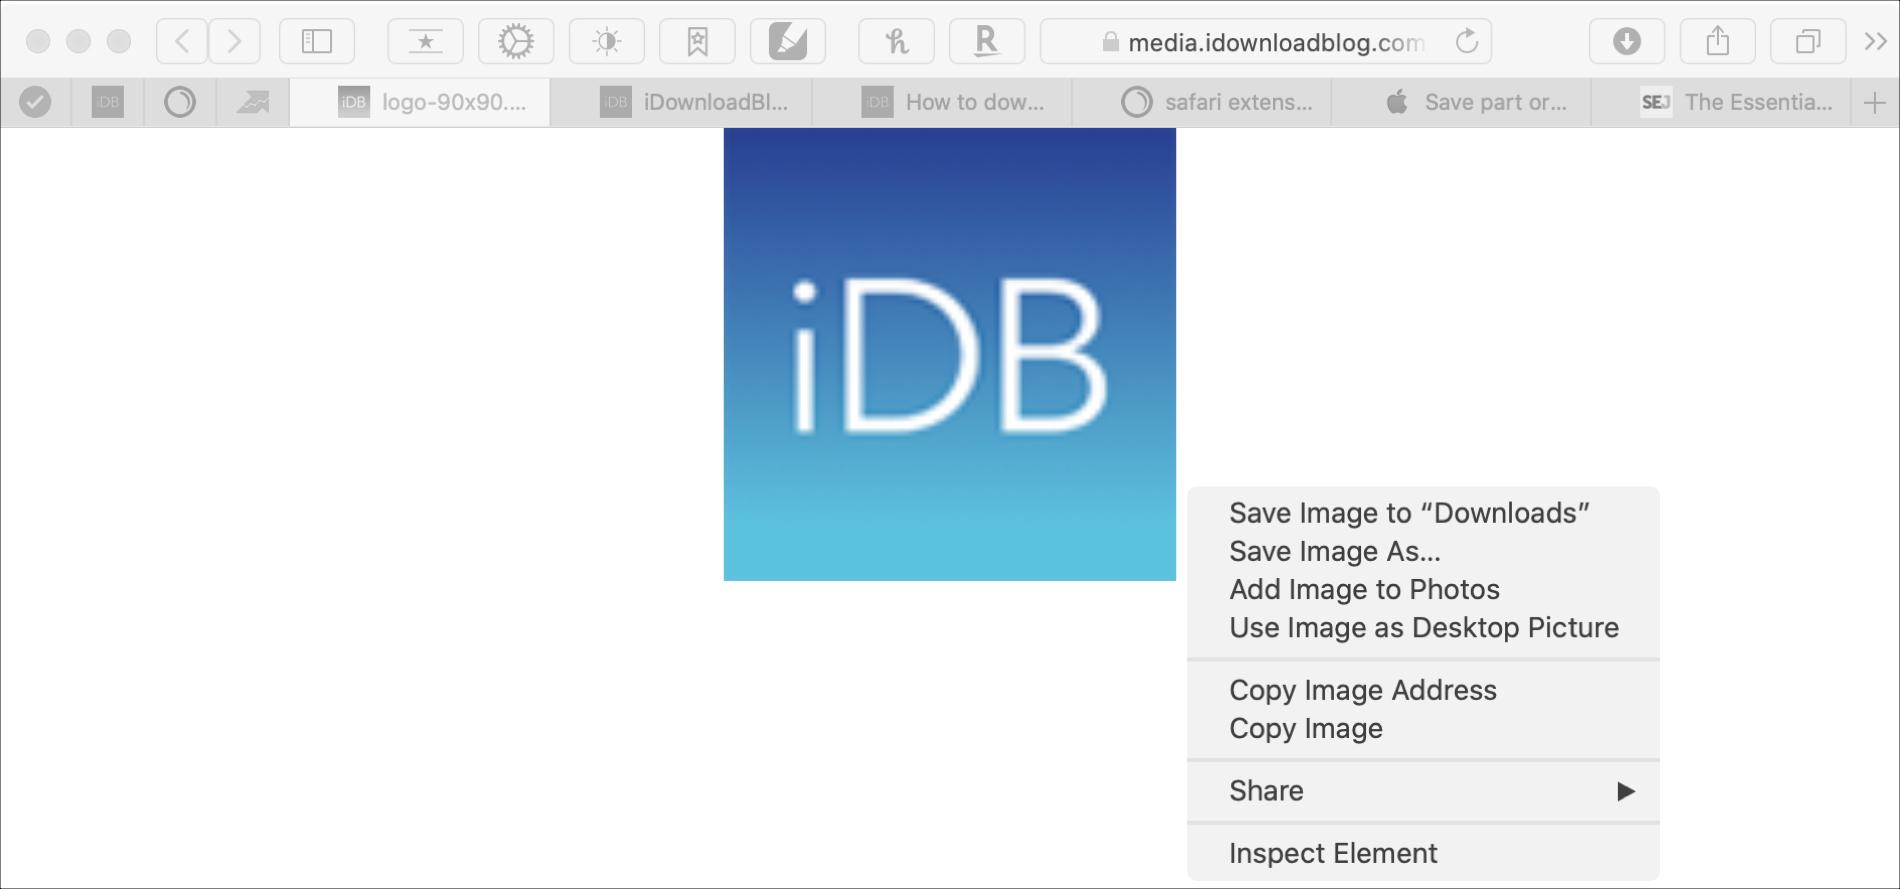 Save Image Mac Safari iDB